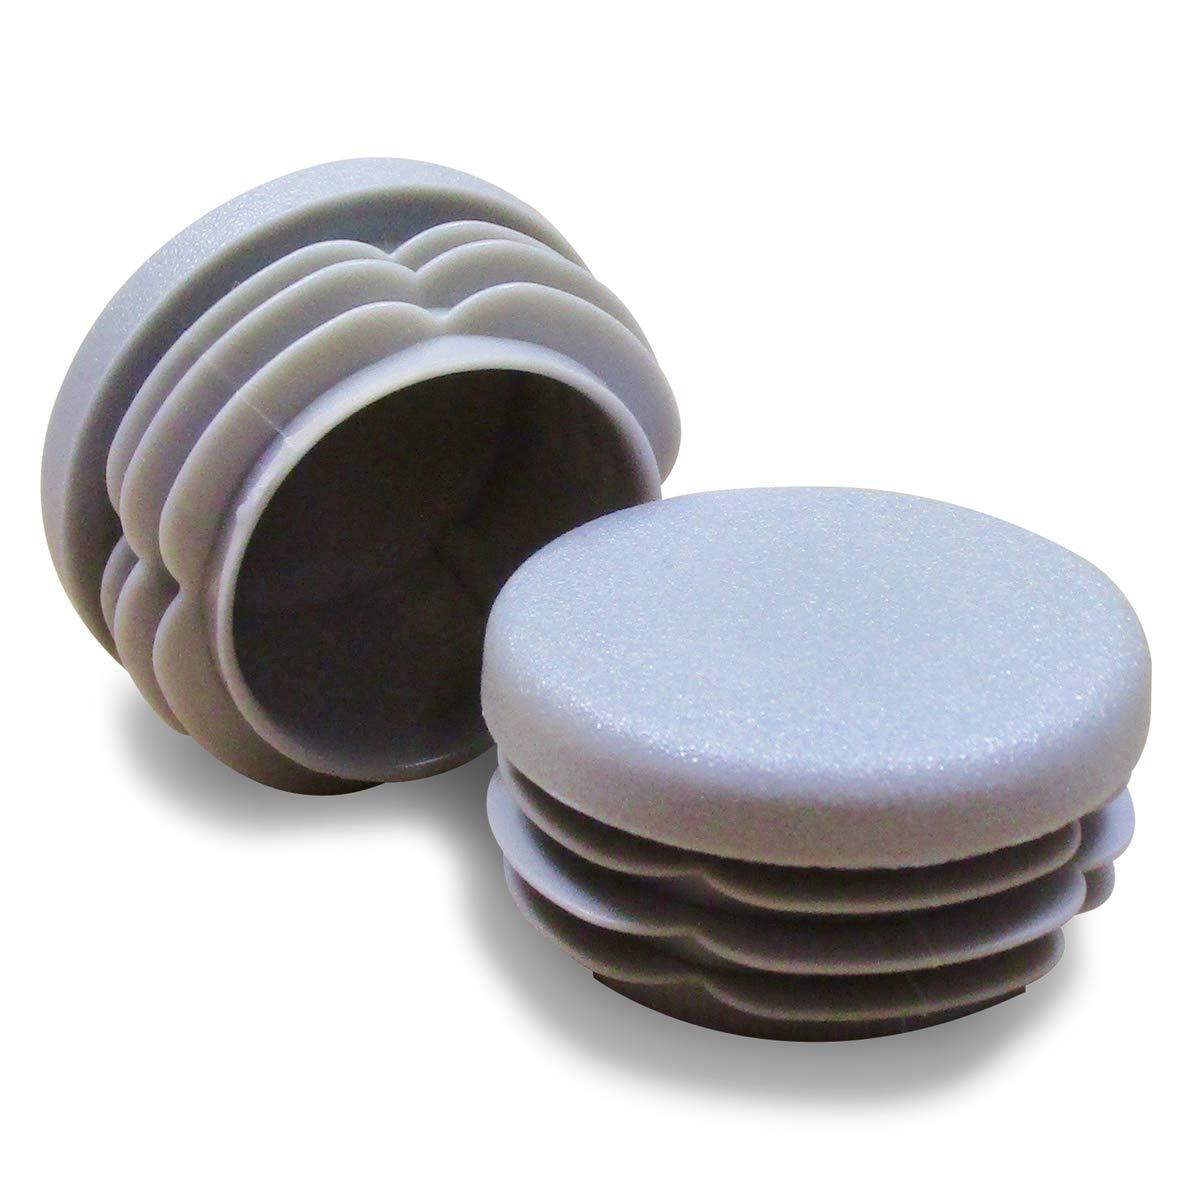 Ajile® - 16 piezas - Contera plasticó redonda de interior para tubo esterior diámetro 25 mm - GRIS - EPR325x16-FBA Ajile®